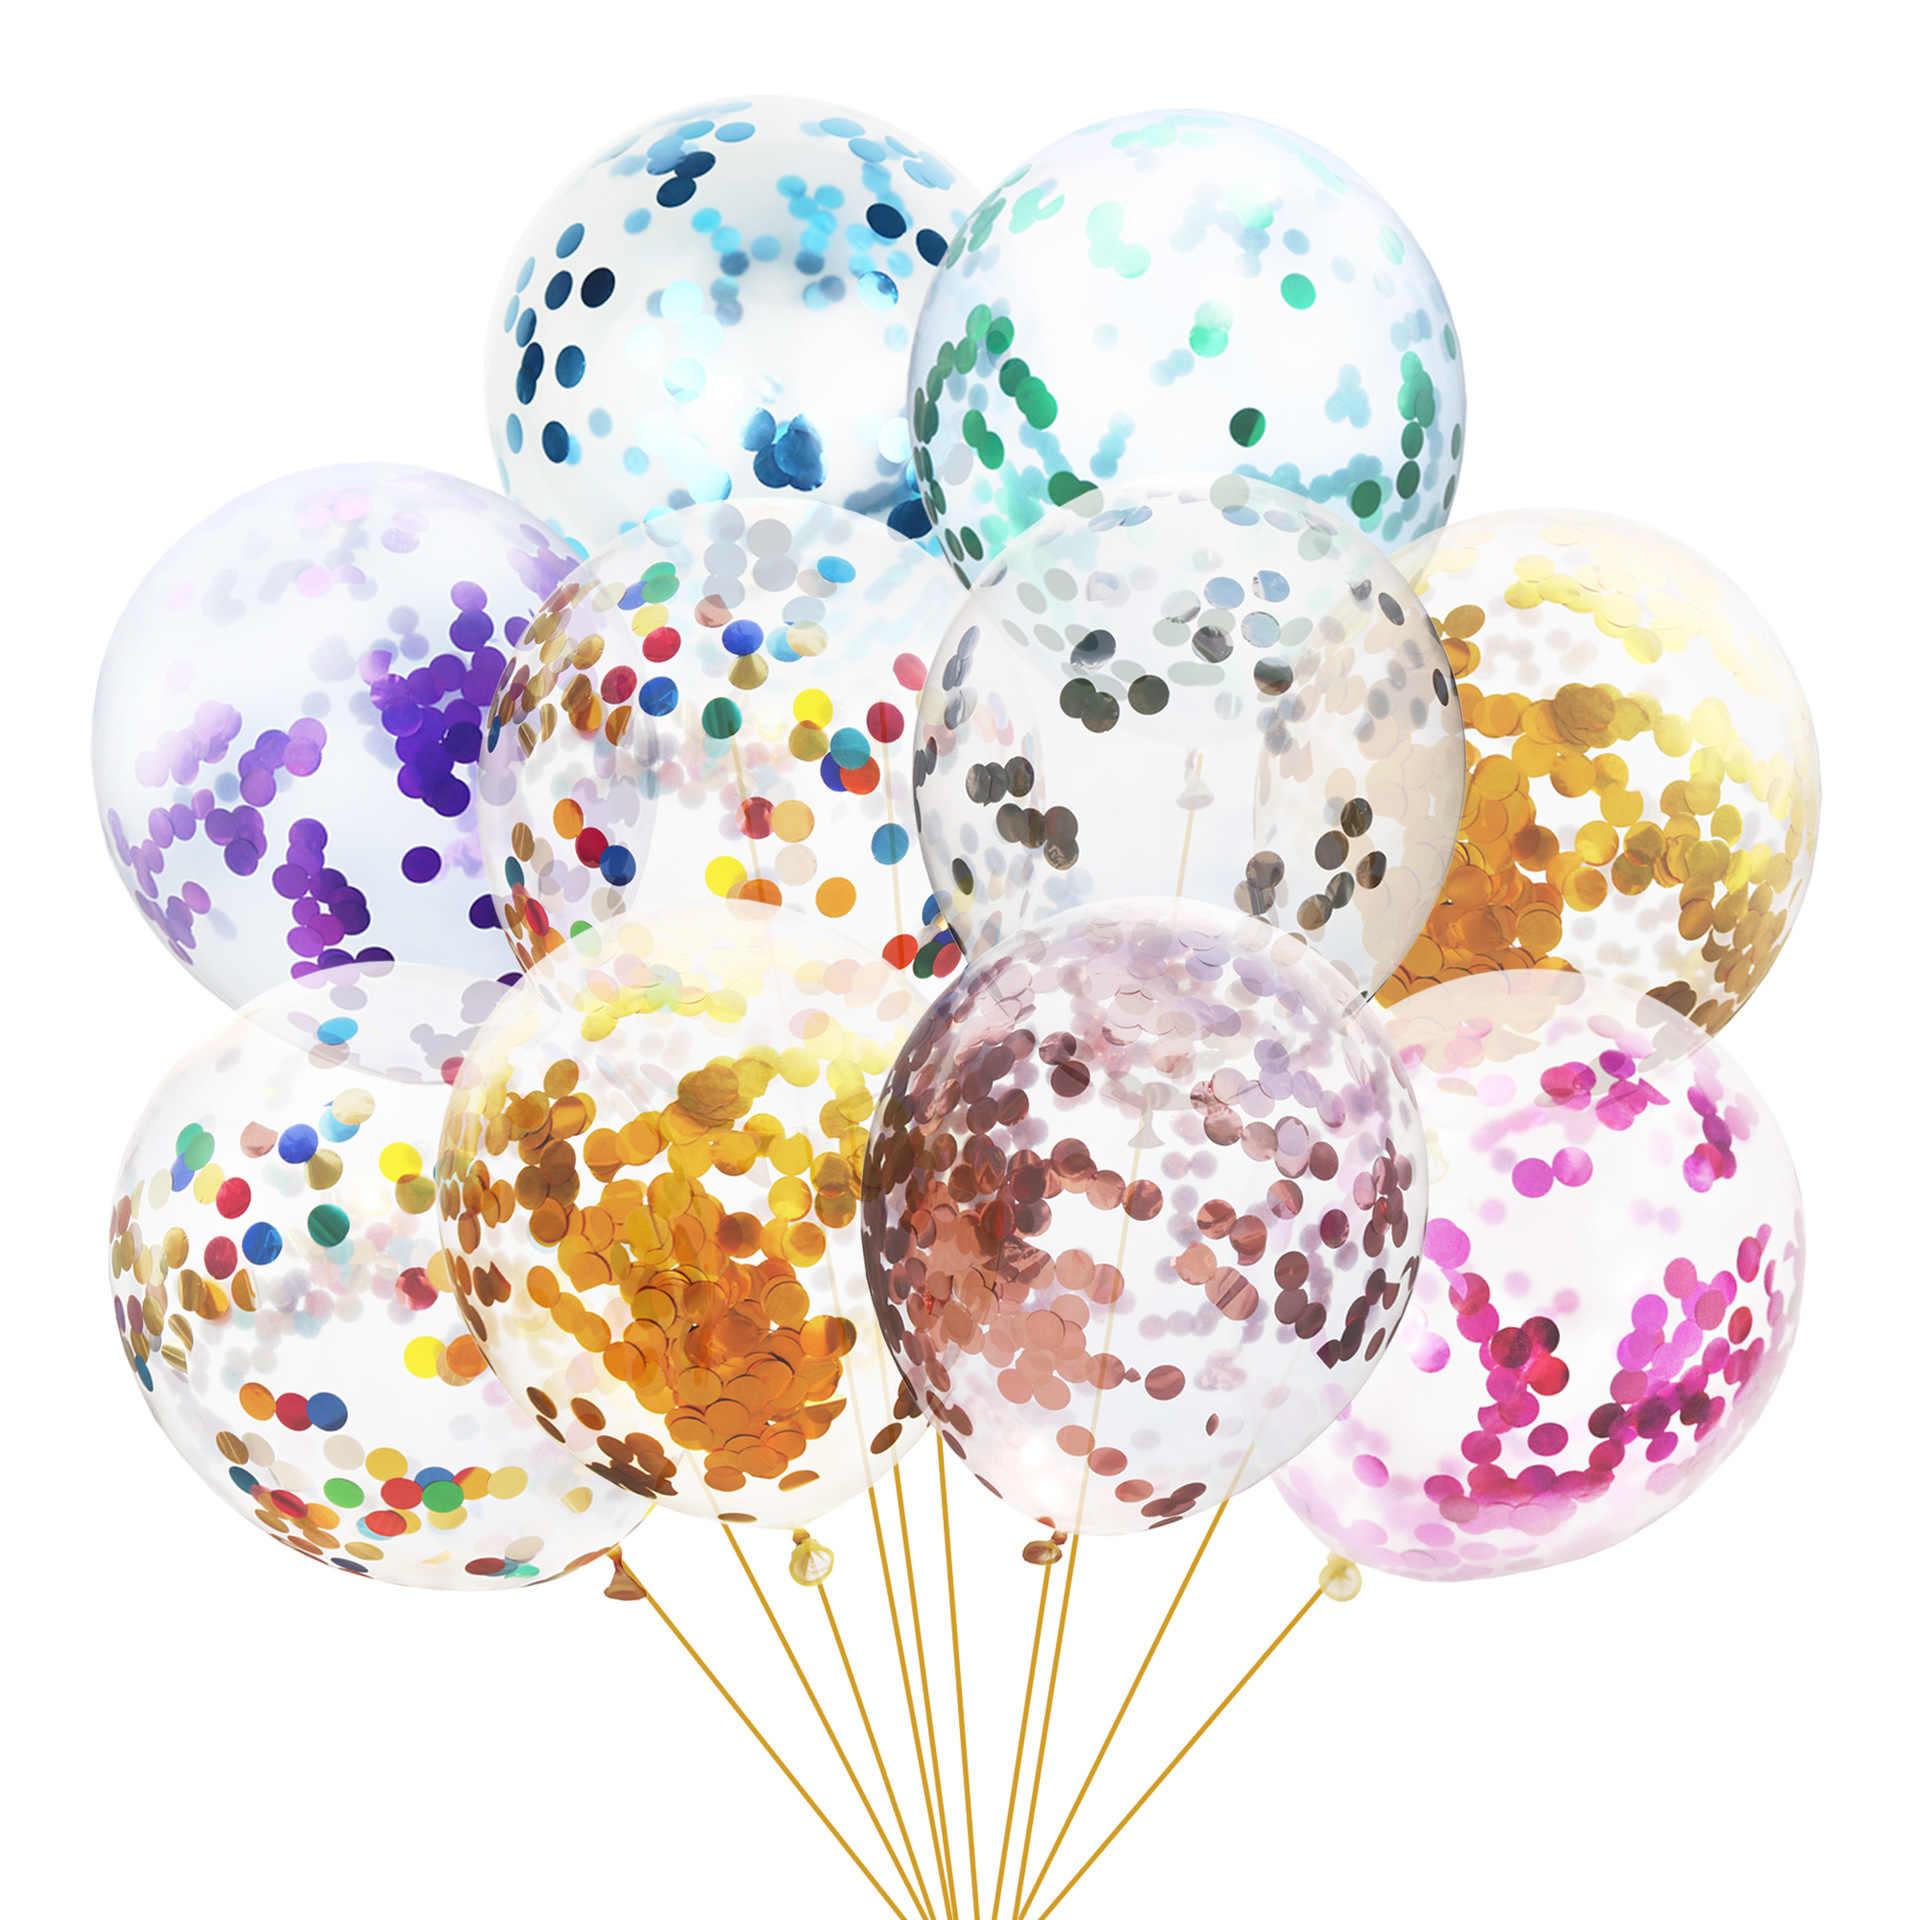 1 Pcs Blue Puing-puing Action Figure 12 Inci Ruang Pesta Dekorasi Gambar Foil Balon Mainan Anak-anak Kartun Hadiah Ulang Tahun